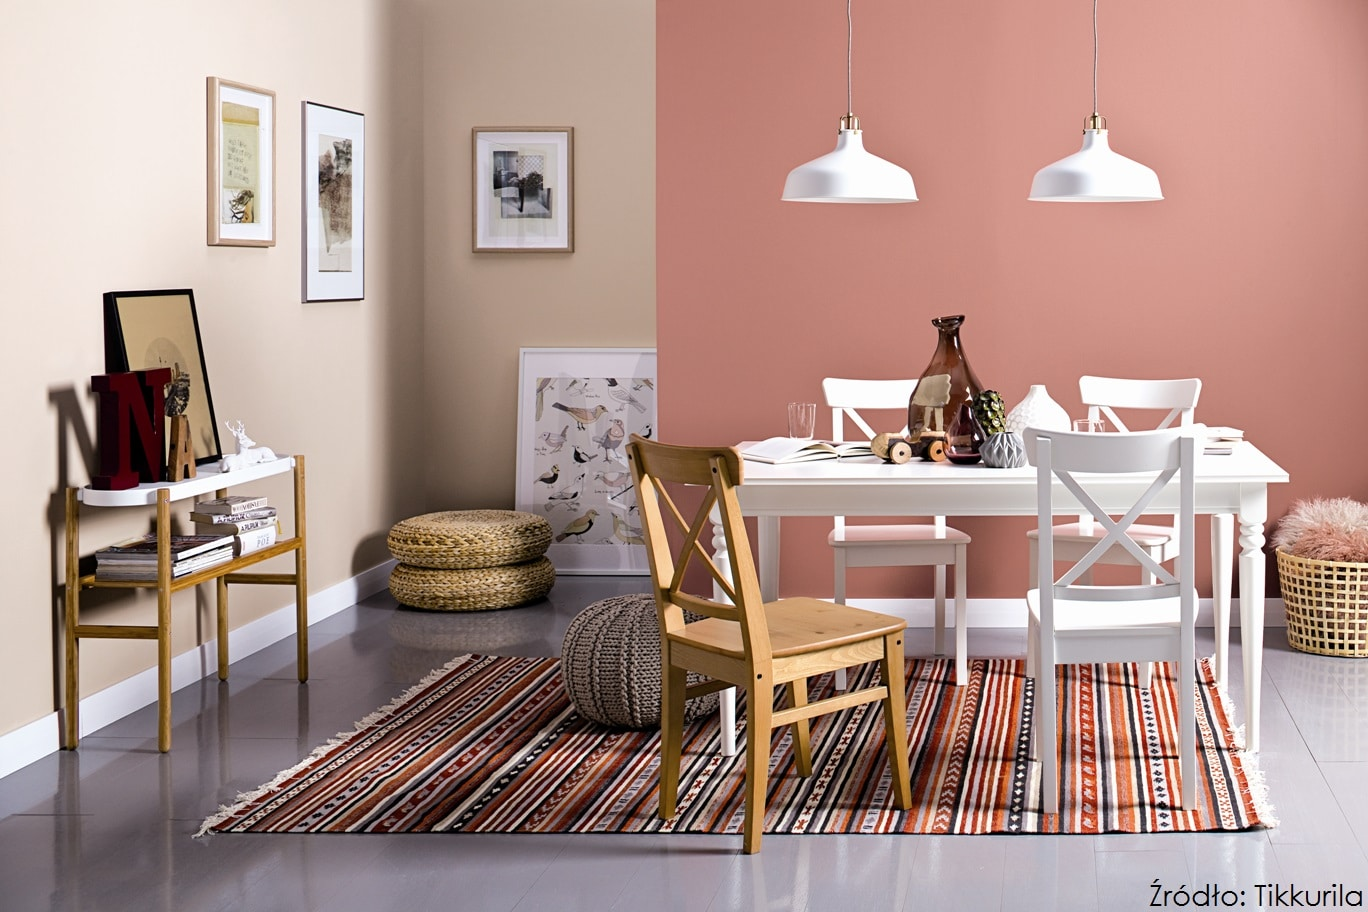 Color Now Hazy_Tikkurila Optiva Satin Matt 7_kolory V418 Rustic; X420 Maiden, Tikkurila Everal Aqua Semi Matt 40_kolor Bialy, Tikkurila Betolux Aqua_kolor 1946